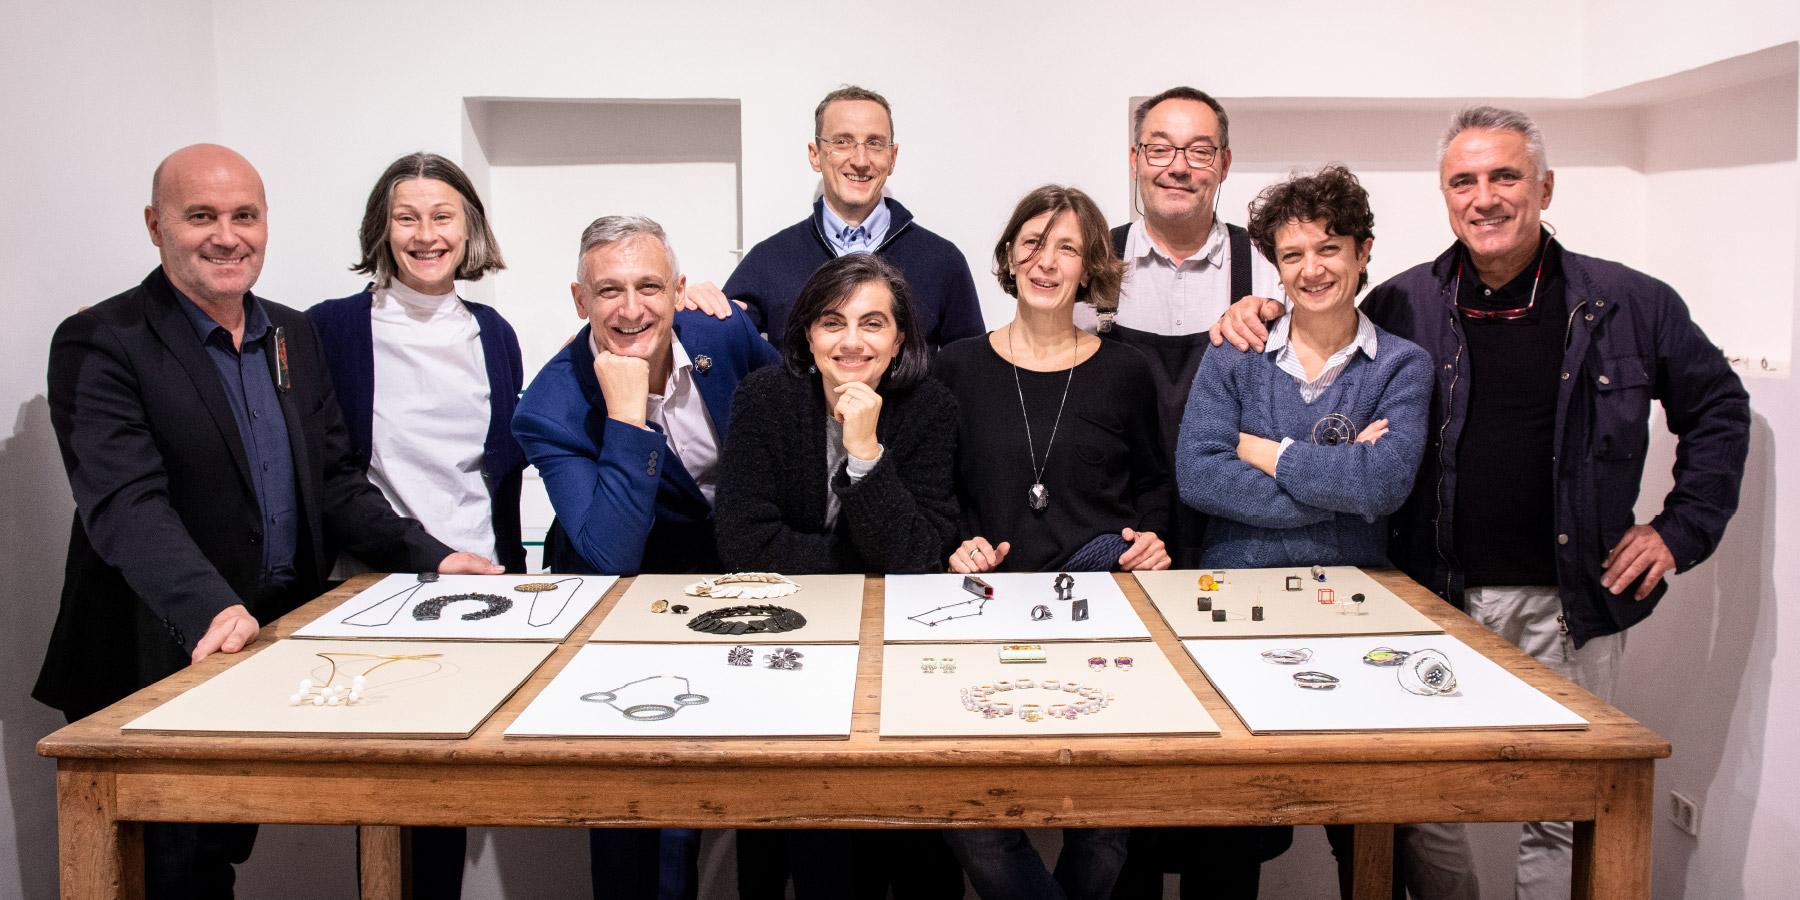 Artists at Vienna Jewelry Days: Gian Luca Bartellone, Maria Diana, Elisabetta Dupre, Konrad Laimer, Stefania Lucchetta, Federica Pallaver, Stenia Scarselli and Giorgio Chiarcos.